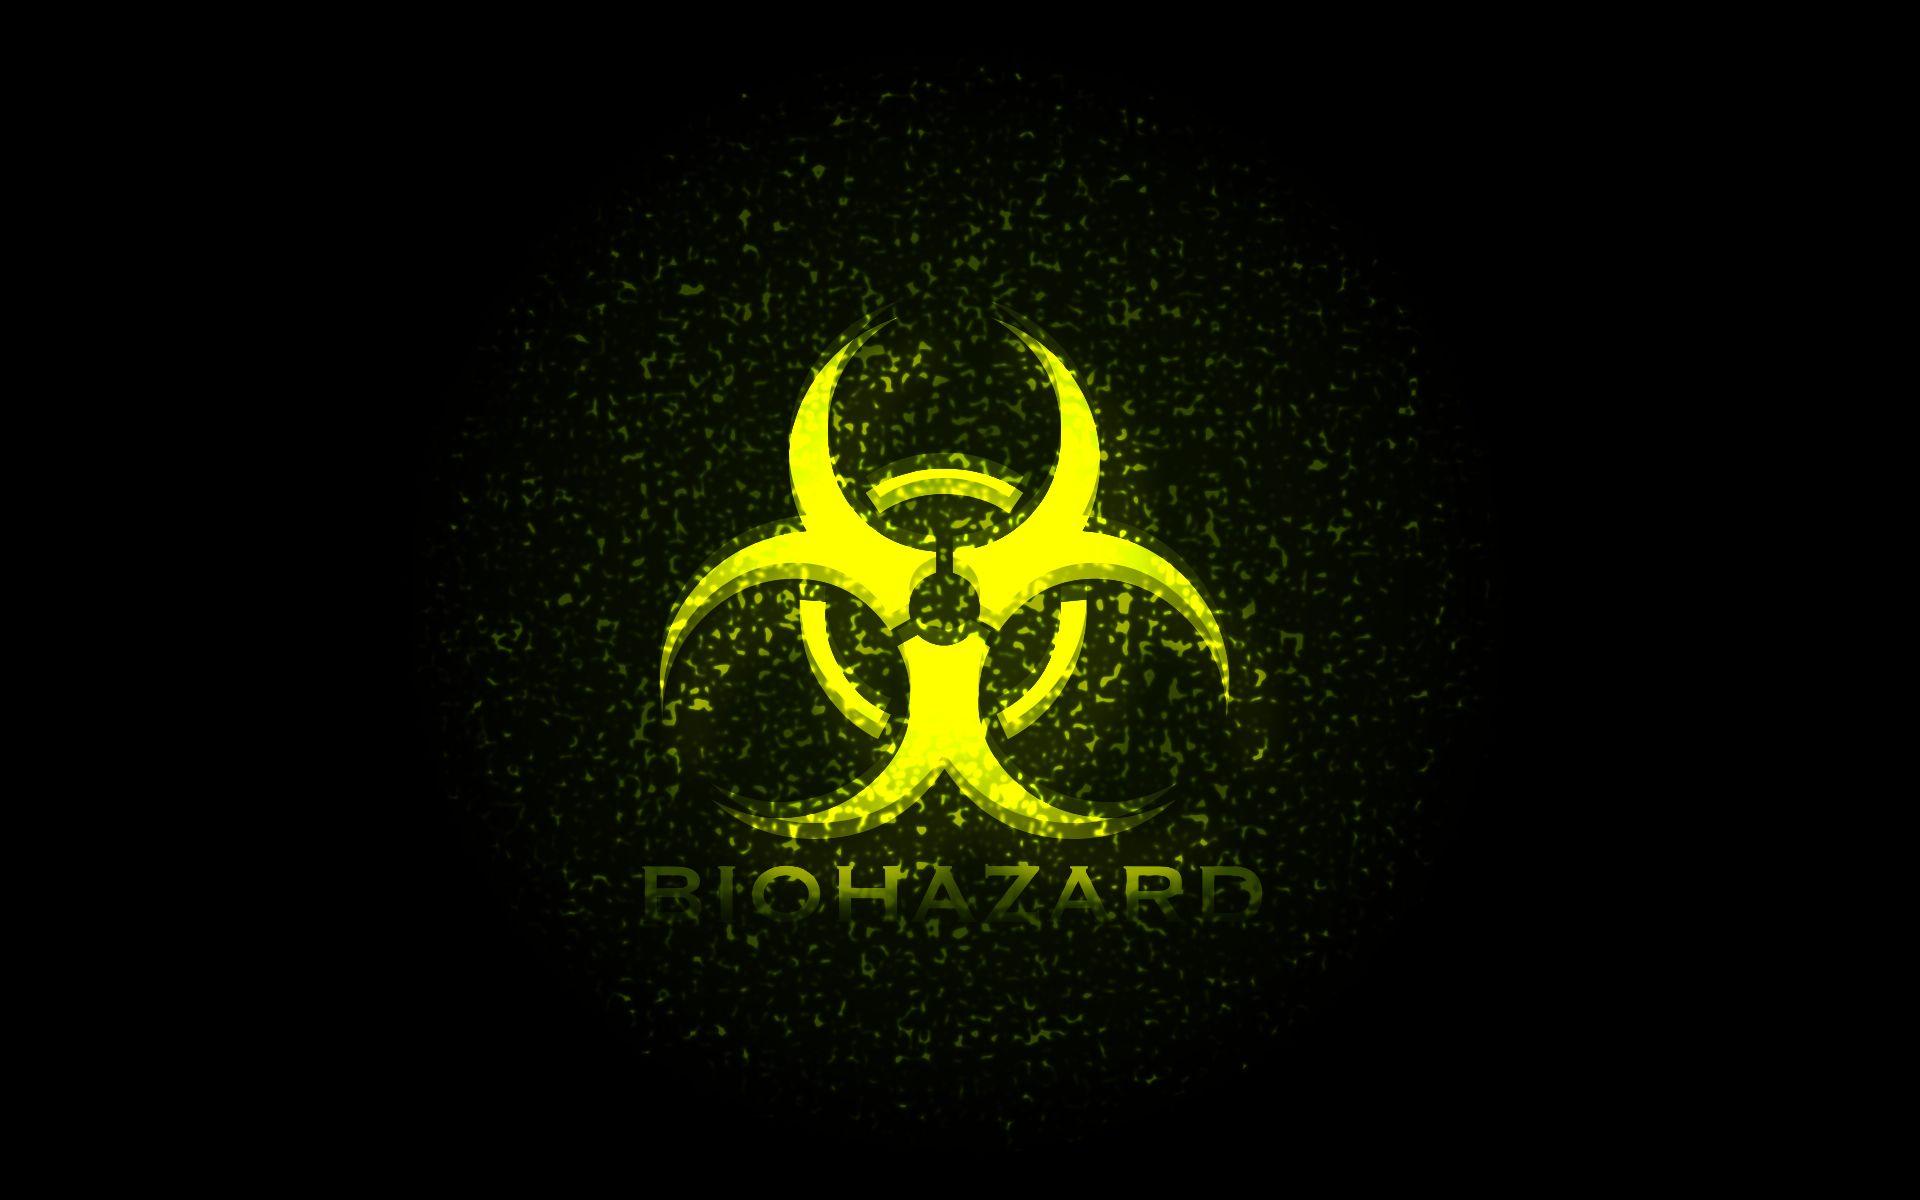 MX Radiation Wallpapers Radiation Adorable Desktop Pictures